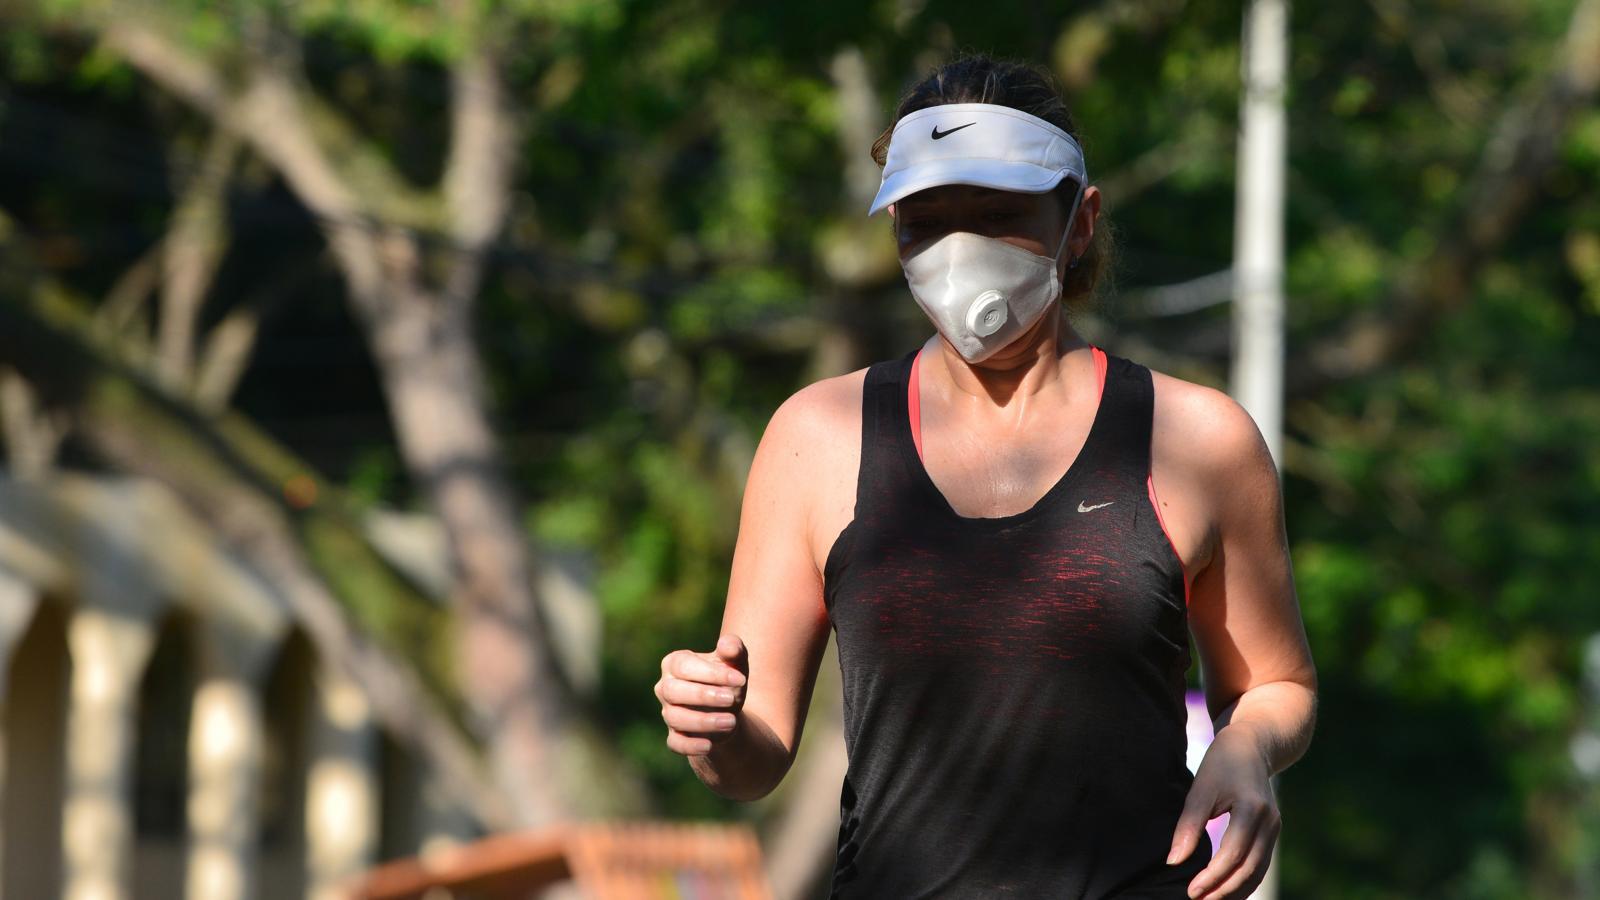 How air pollution exacerbates Covid-19